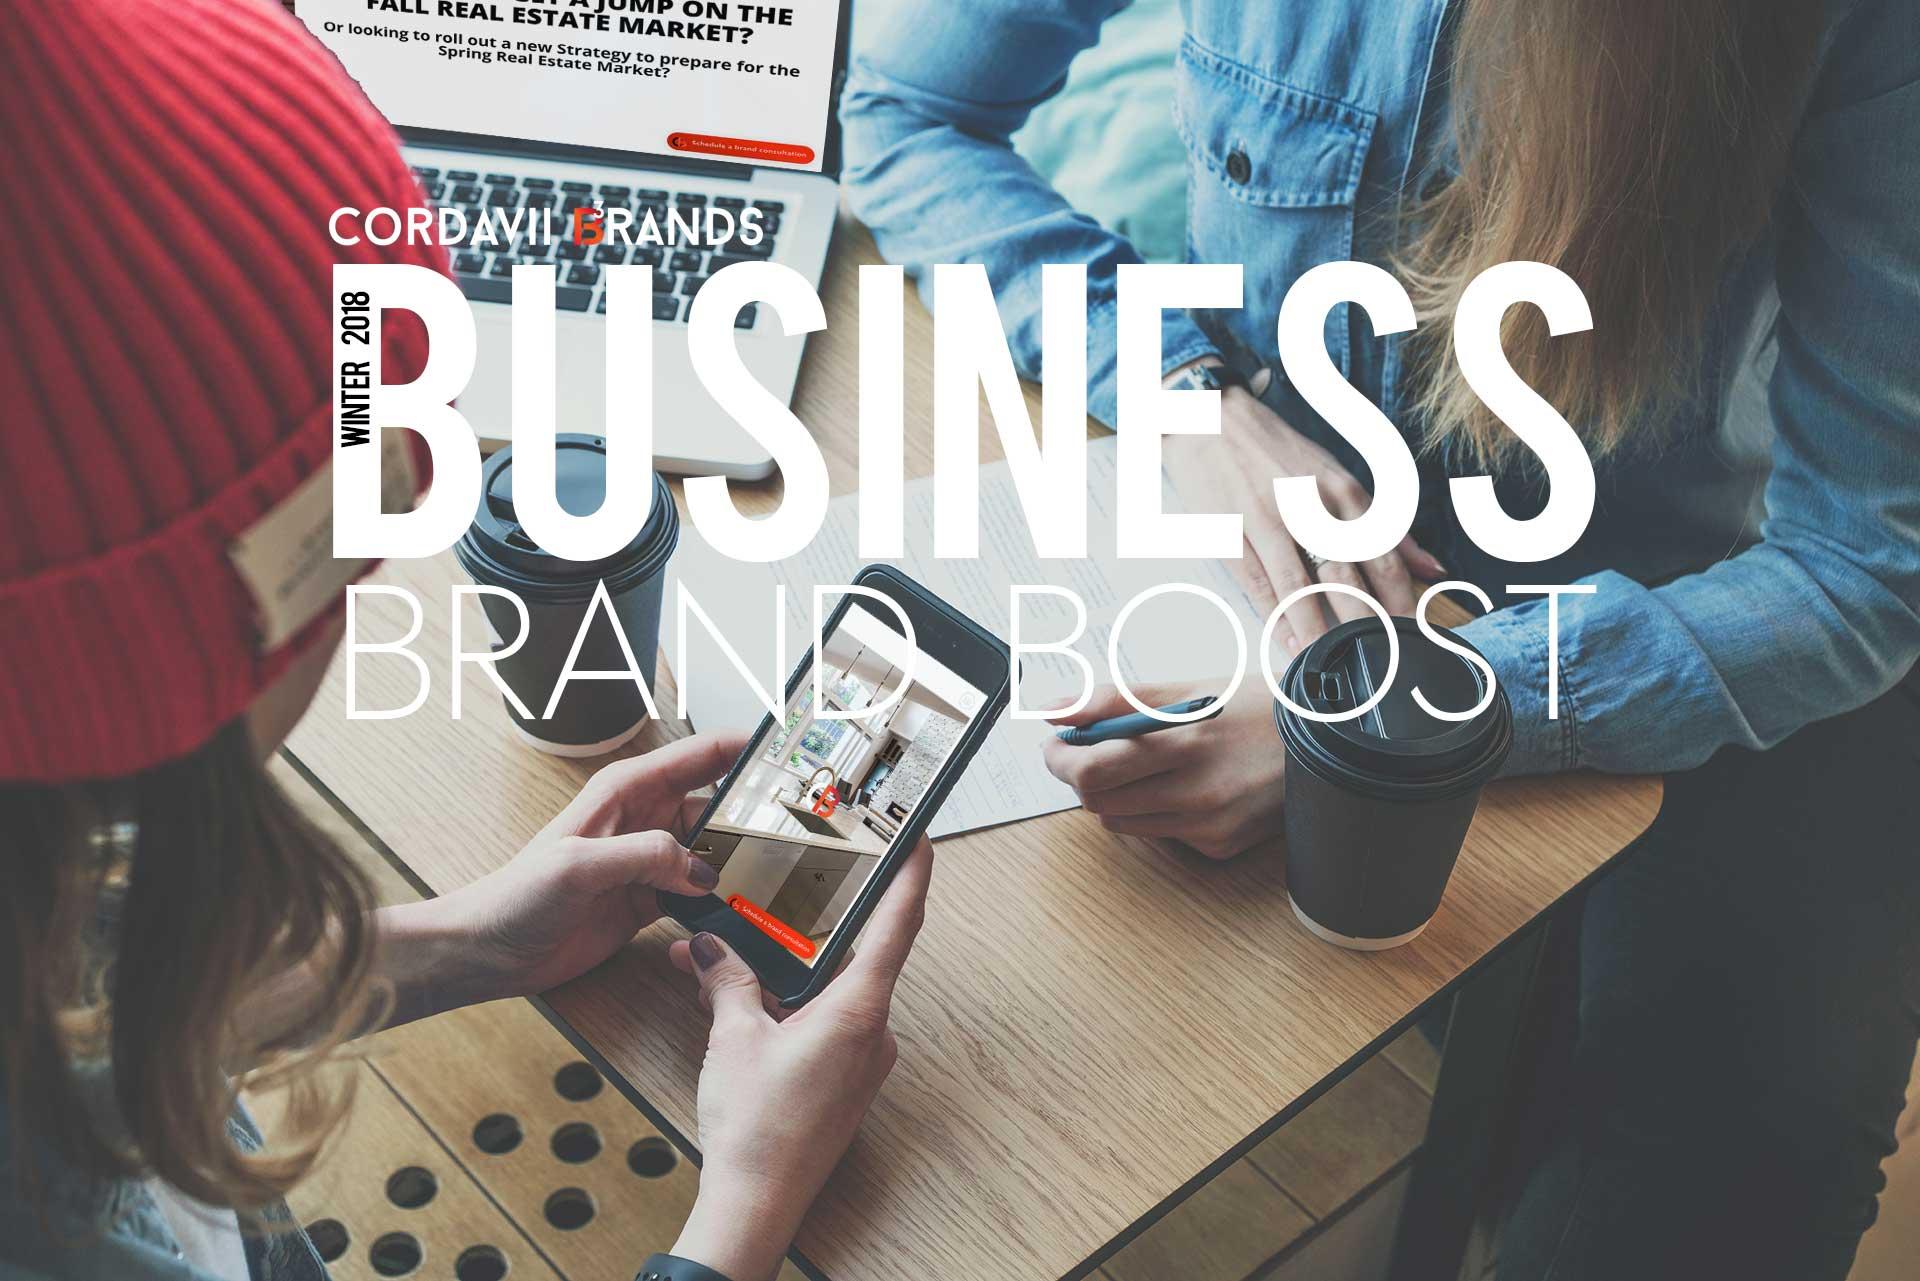 Cordavii Business Brand Boost 2018